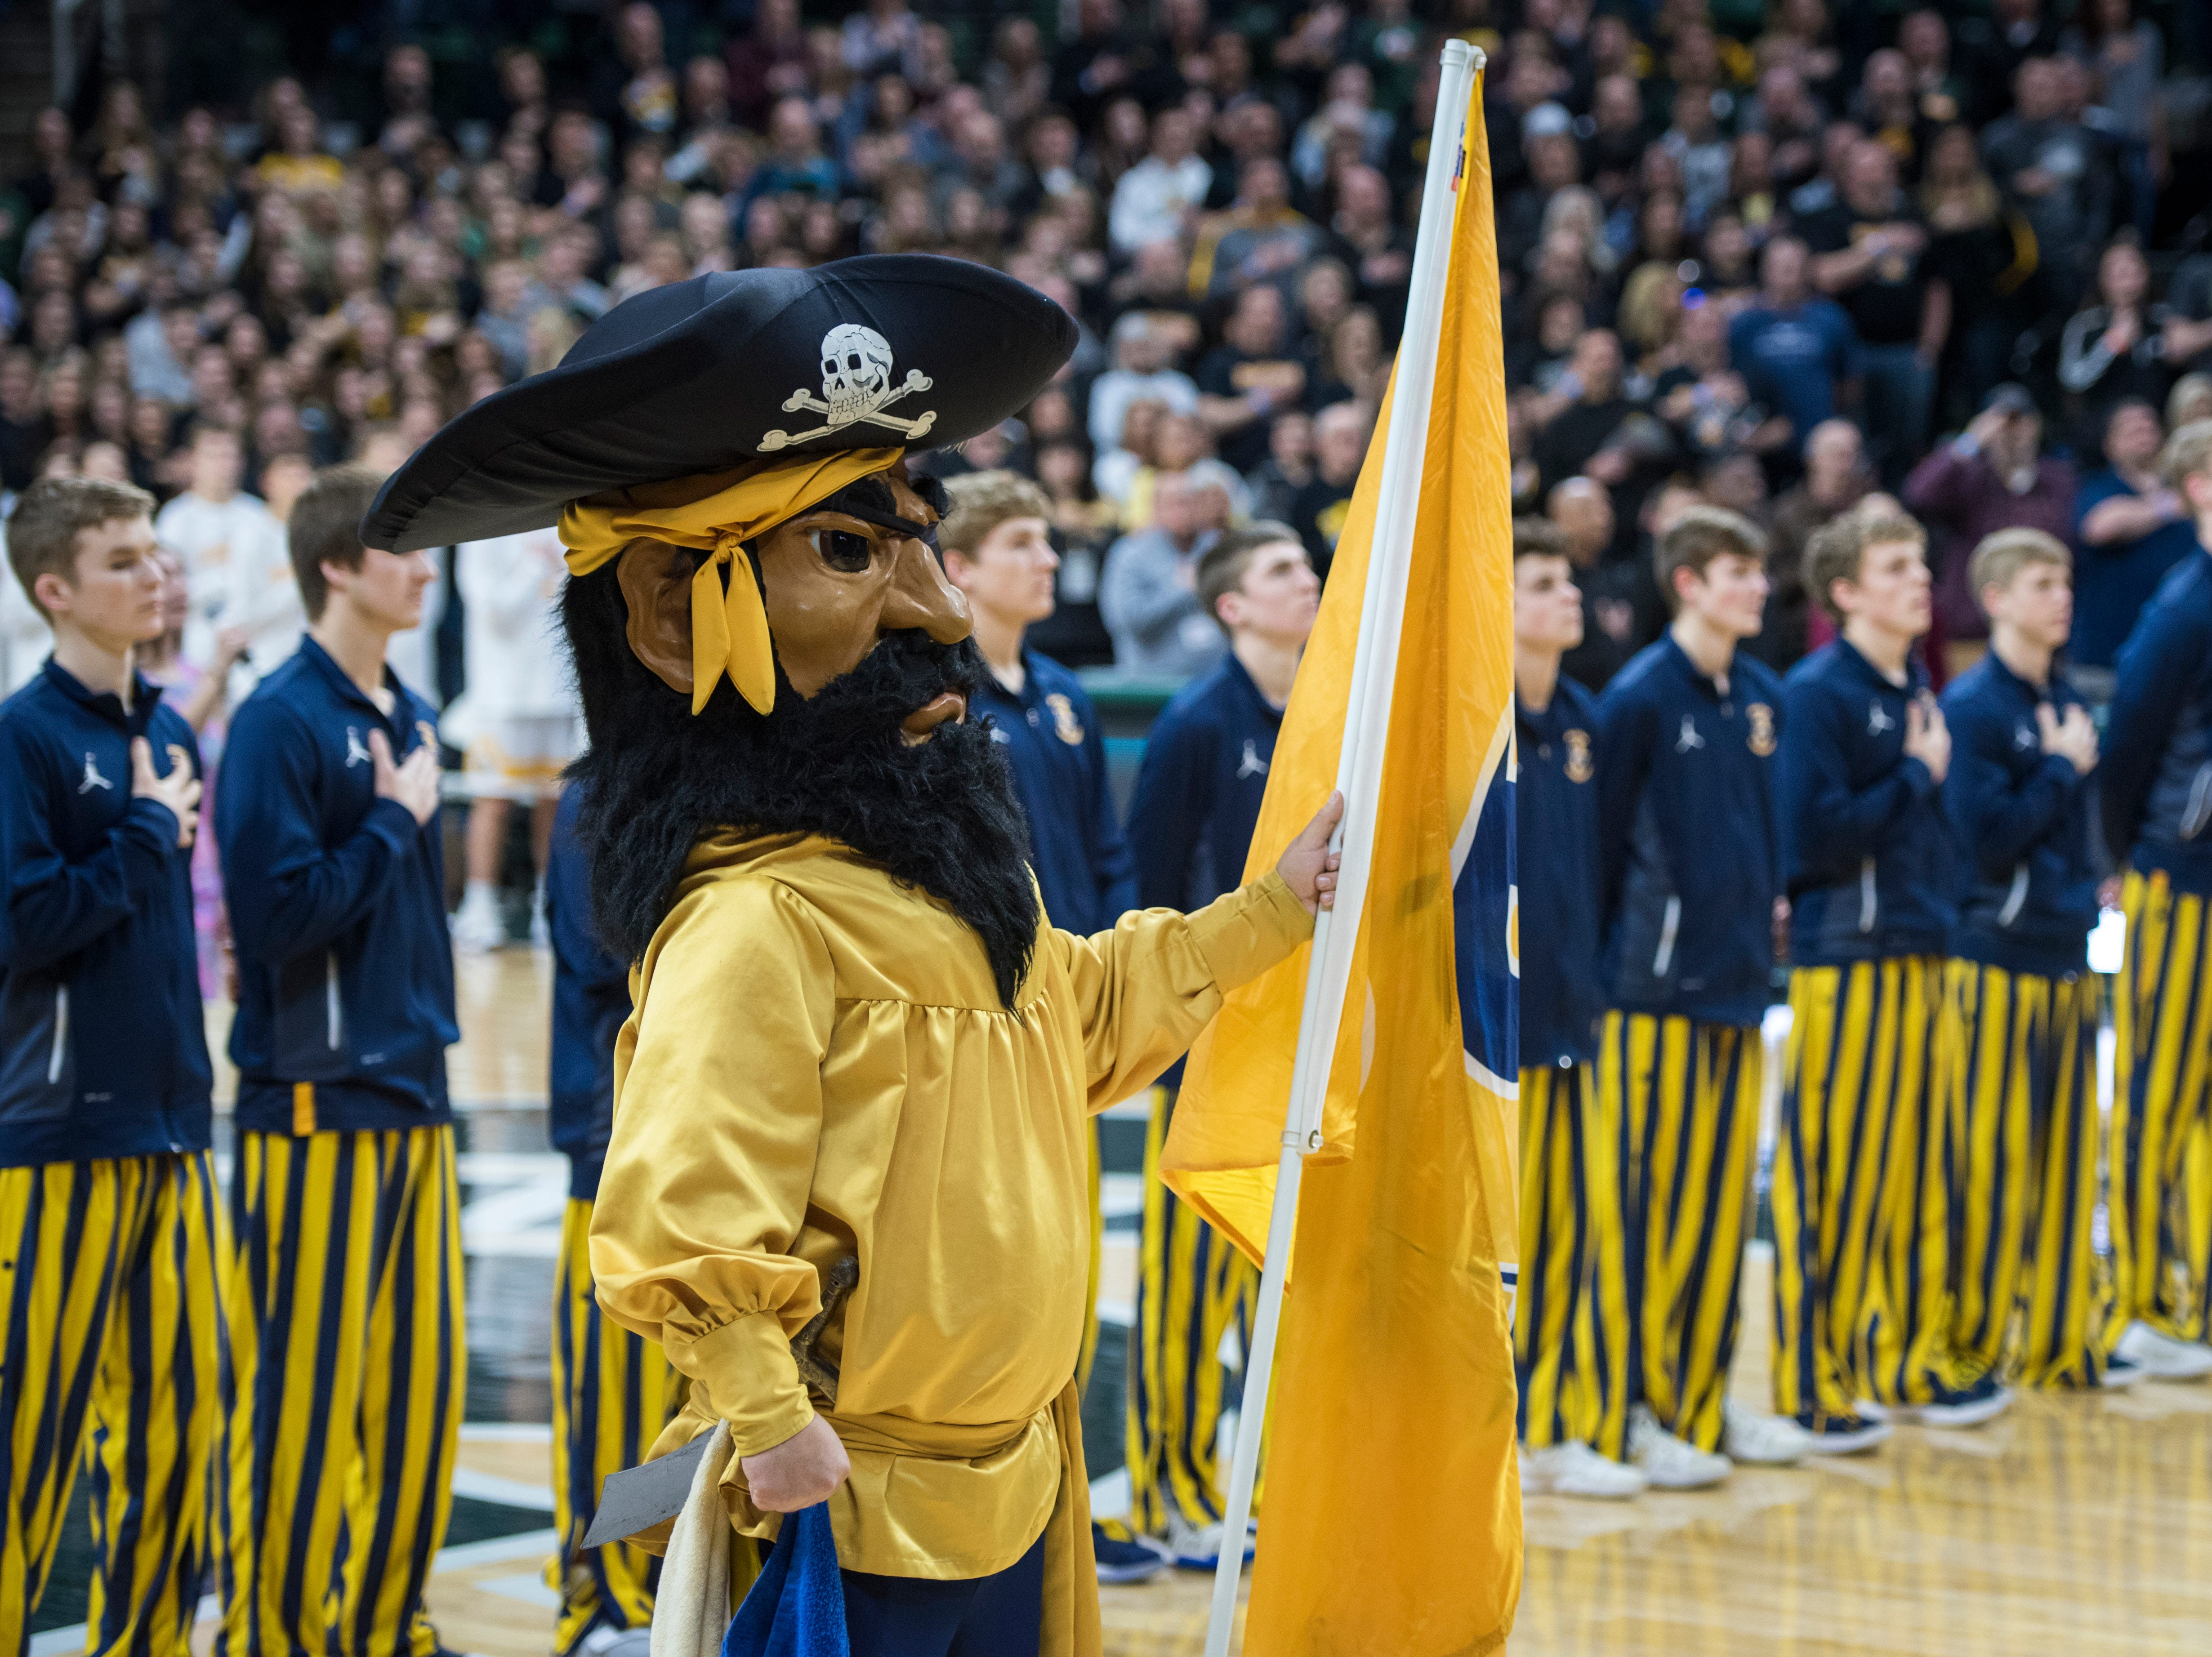 Pewamo-Westphalia's mascot observes the national anthem before the game.